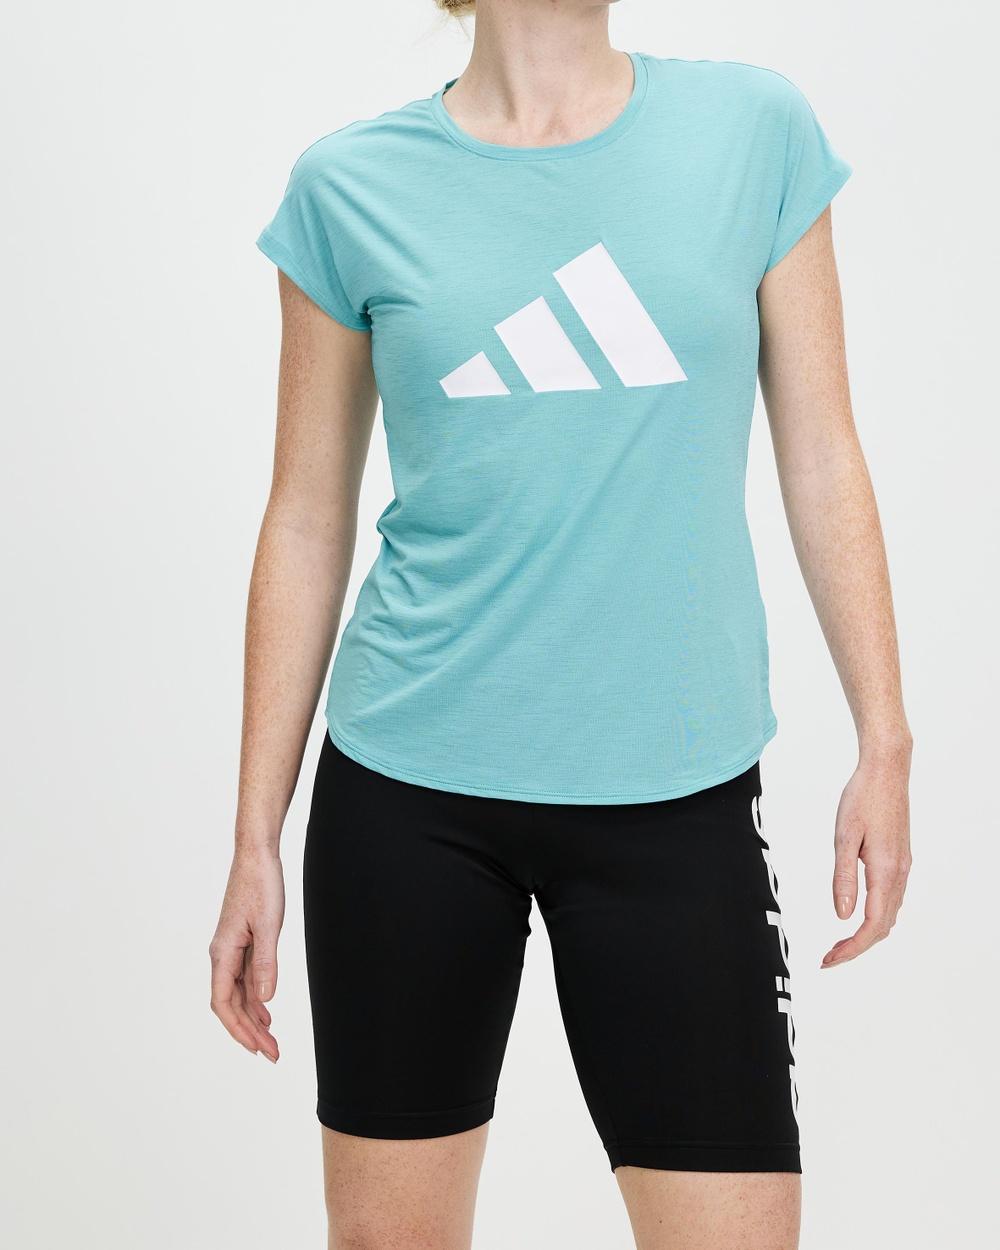 adidas Performance 3 Stripes Training Tee Short Sleeve T-Shirts Mint Ton & White 3-Stripes